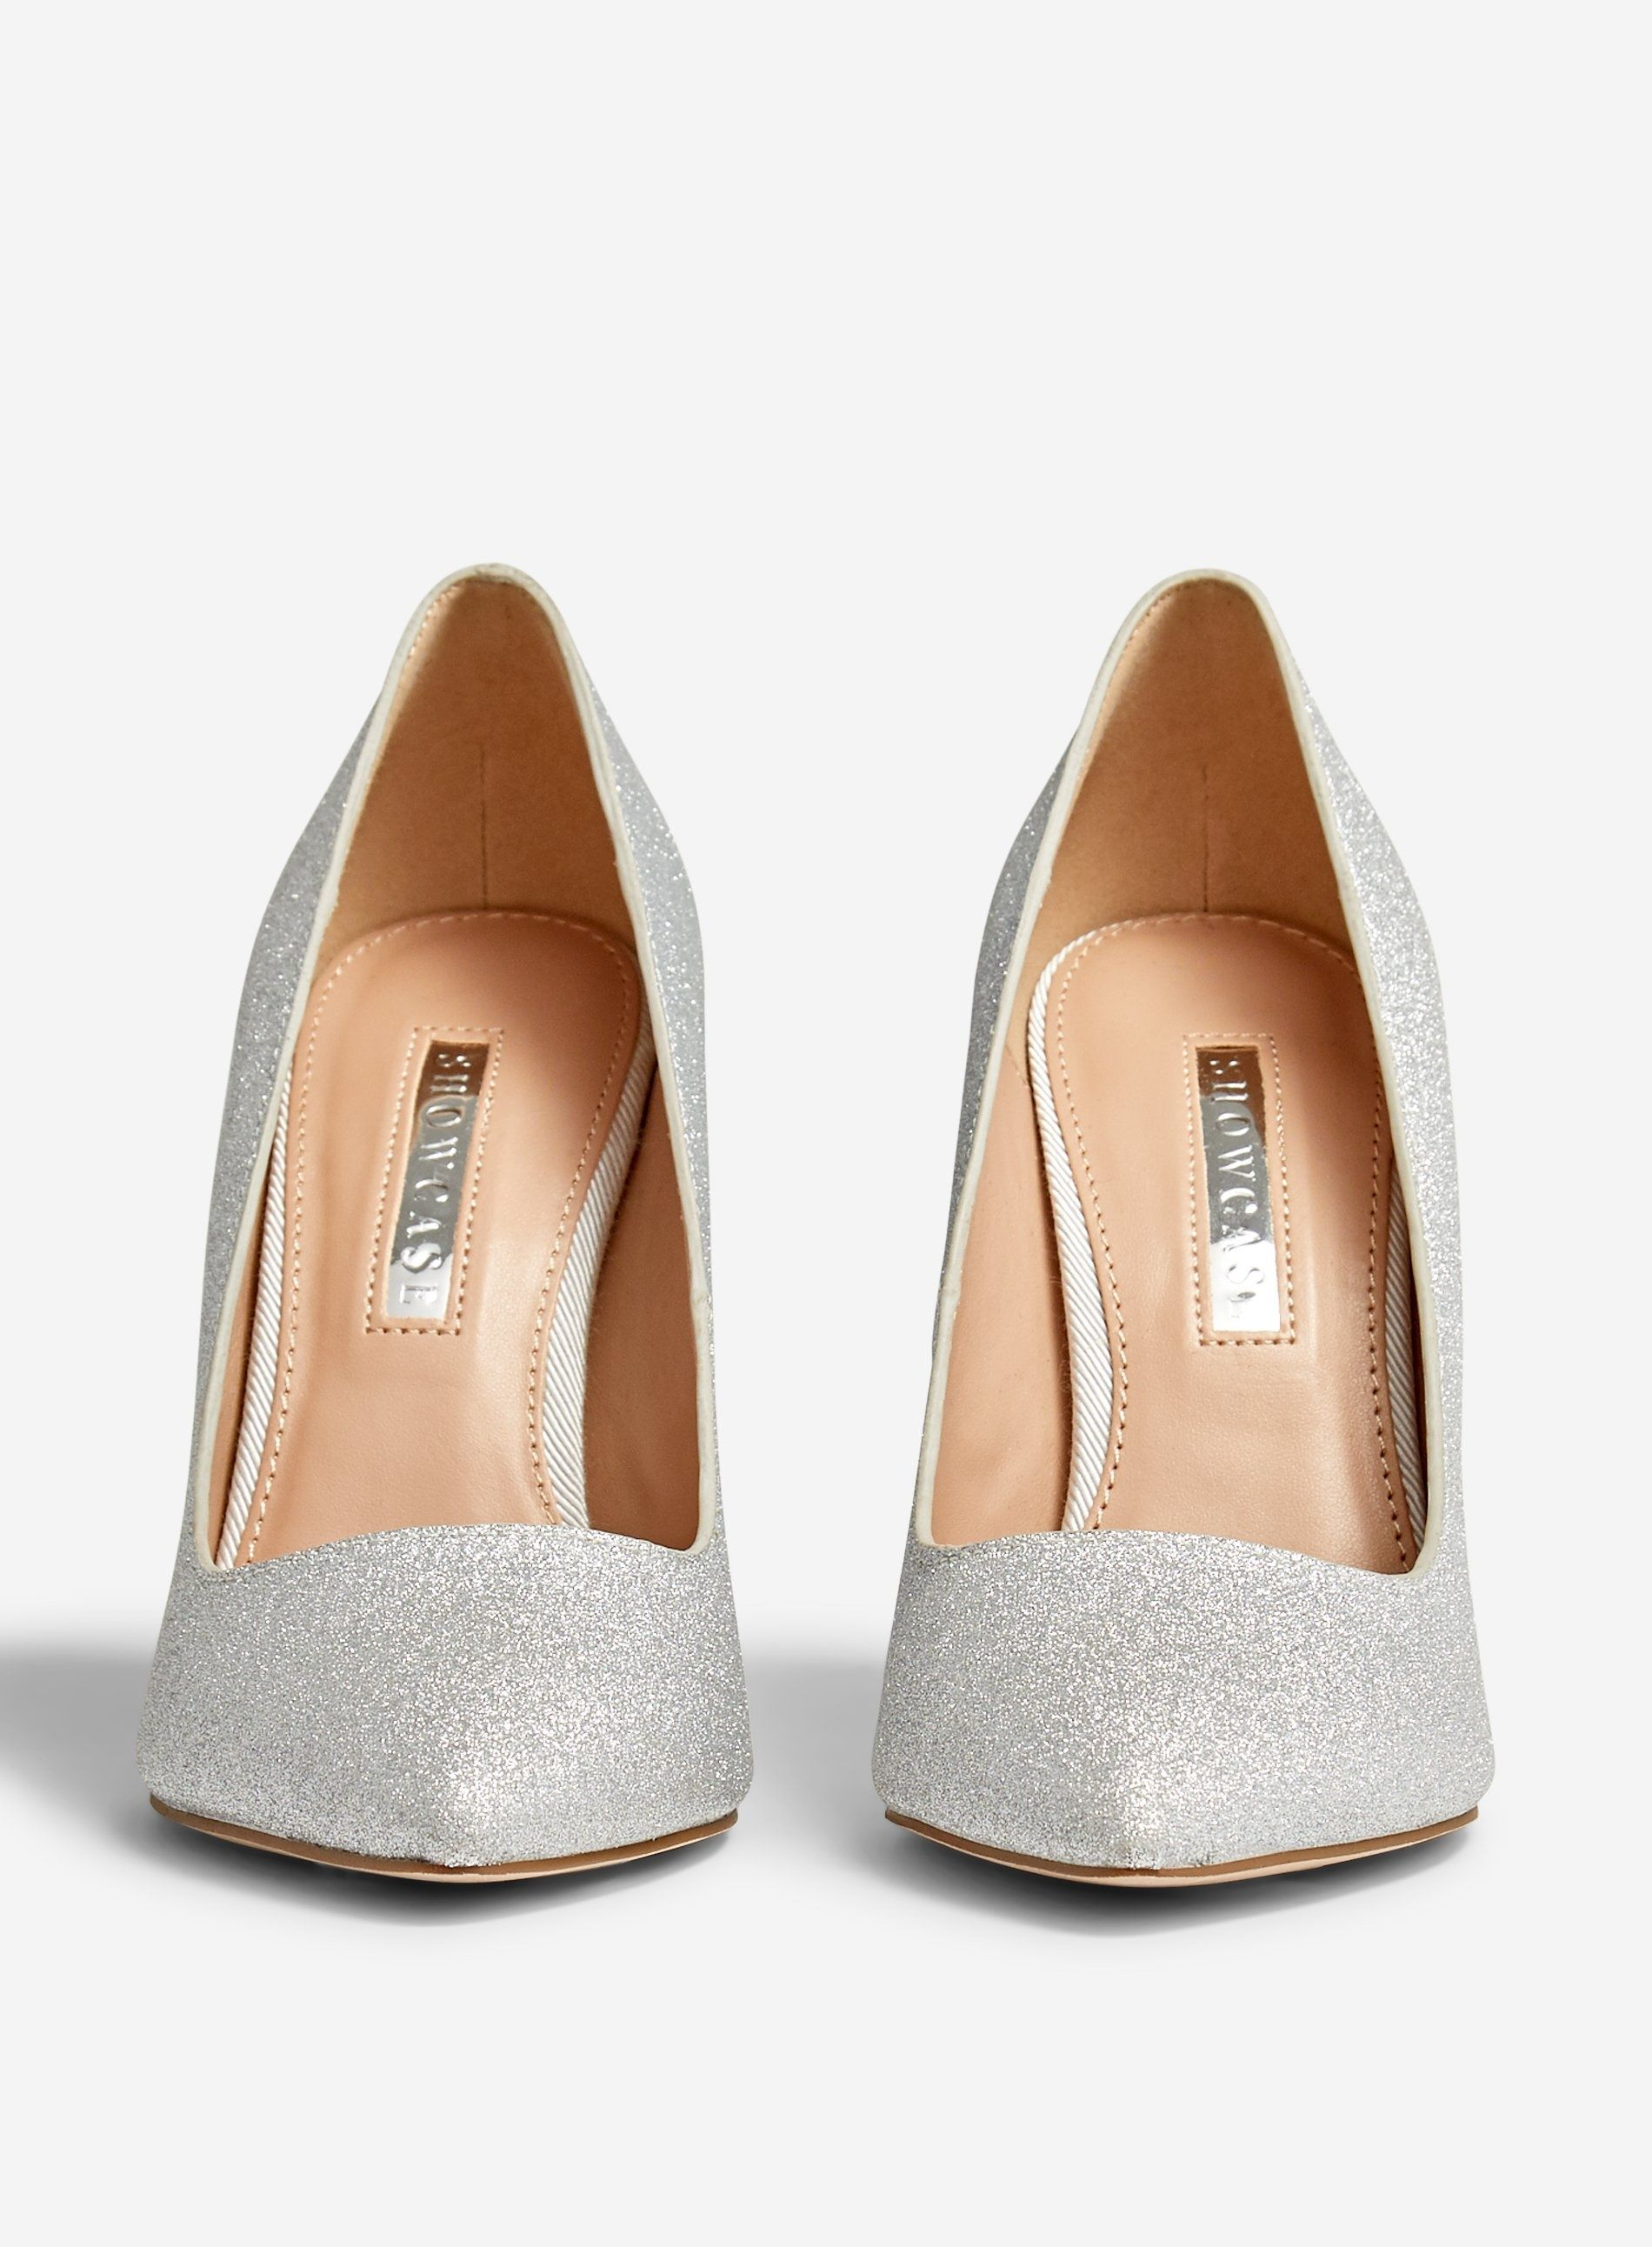 Dorothy Perkins Womens Showcase Silver Berty Glitter Court Shoes Heels Pumps